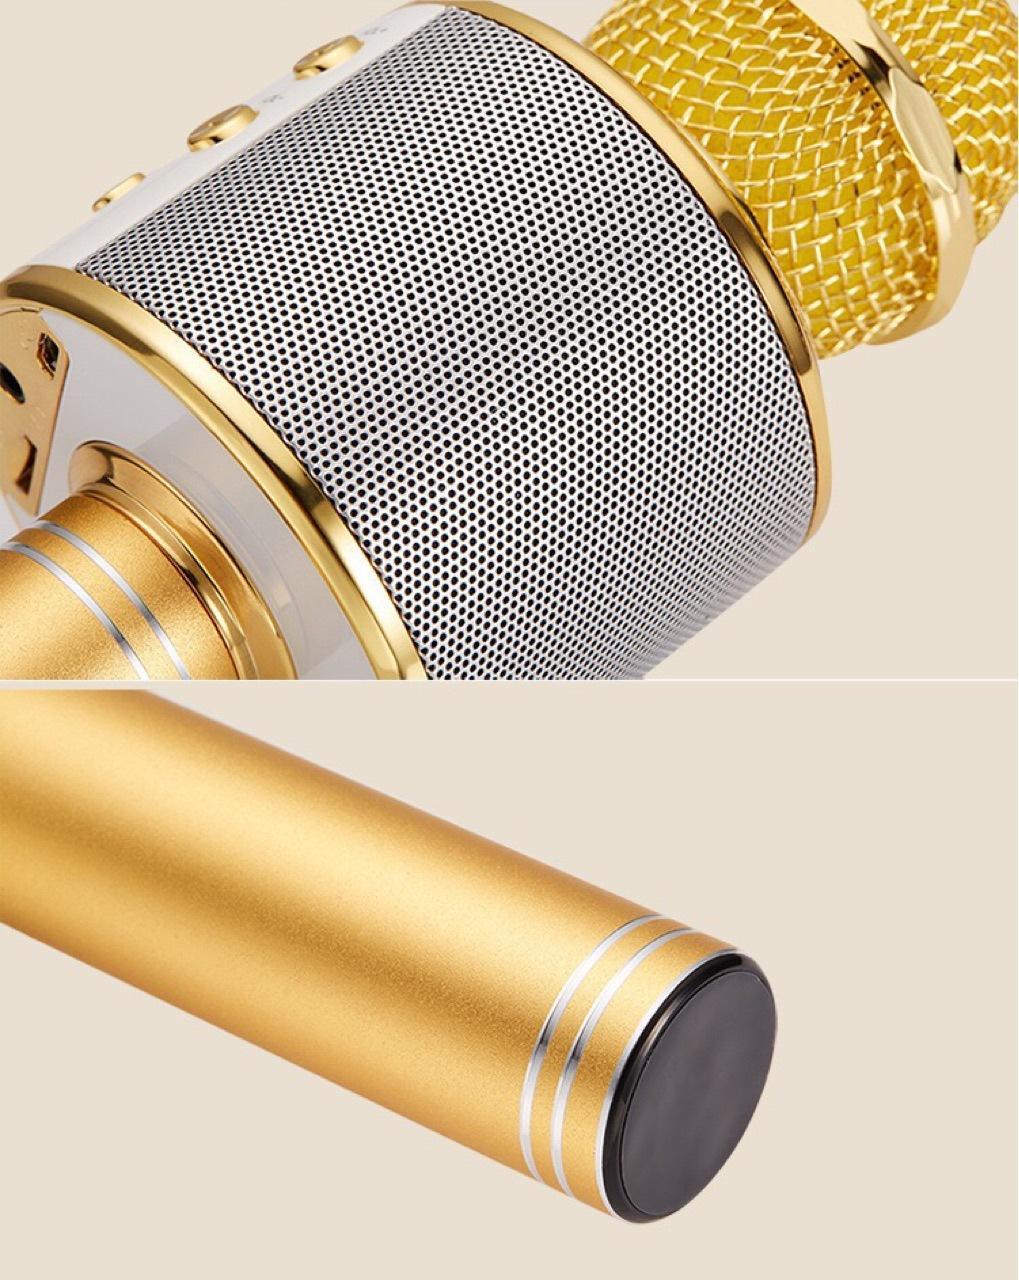 WS858 wireless USB microphones professionals condensers karaokes mic bluetooth stand radio mikrofon studio recording studio WS858